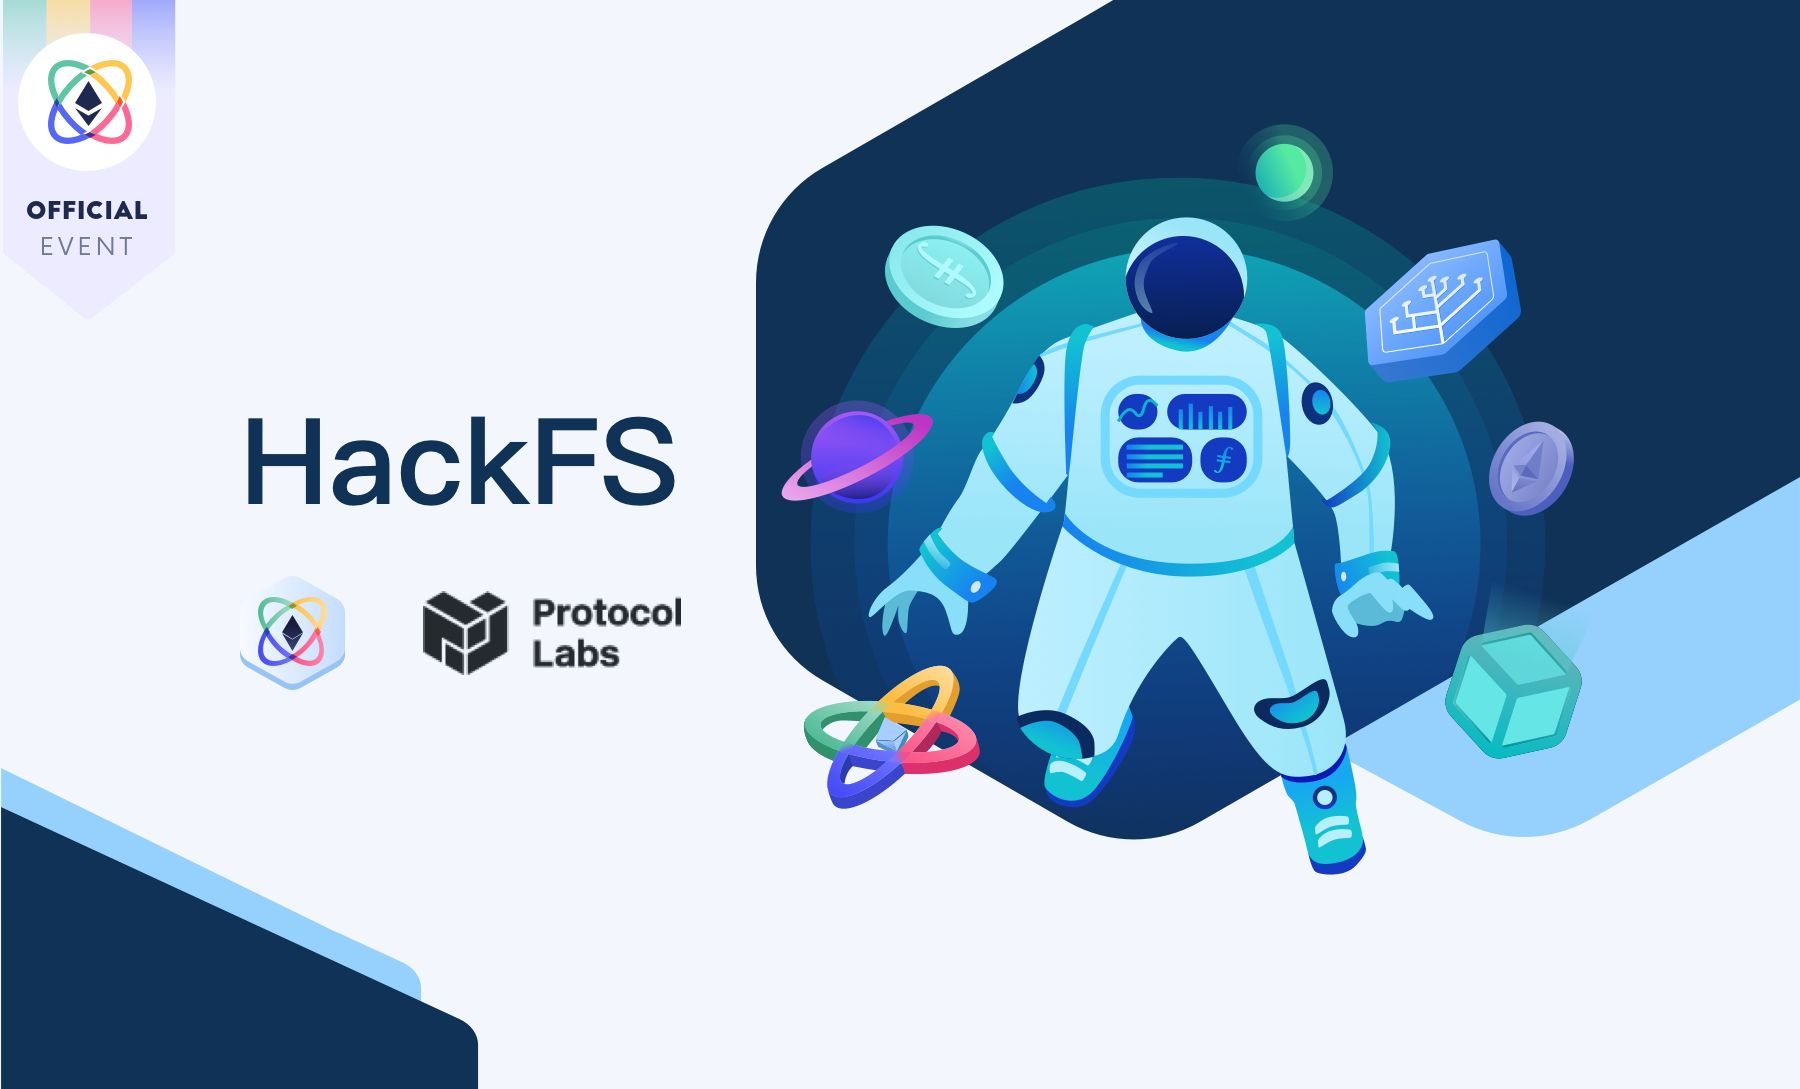 ETHGlobal 邀你共建 web3 基础设施:HackFS 黑客松开启报名